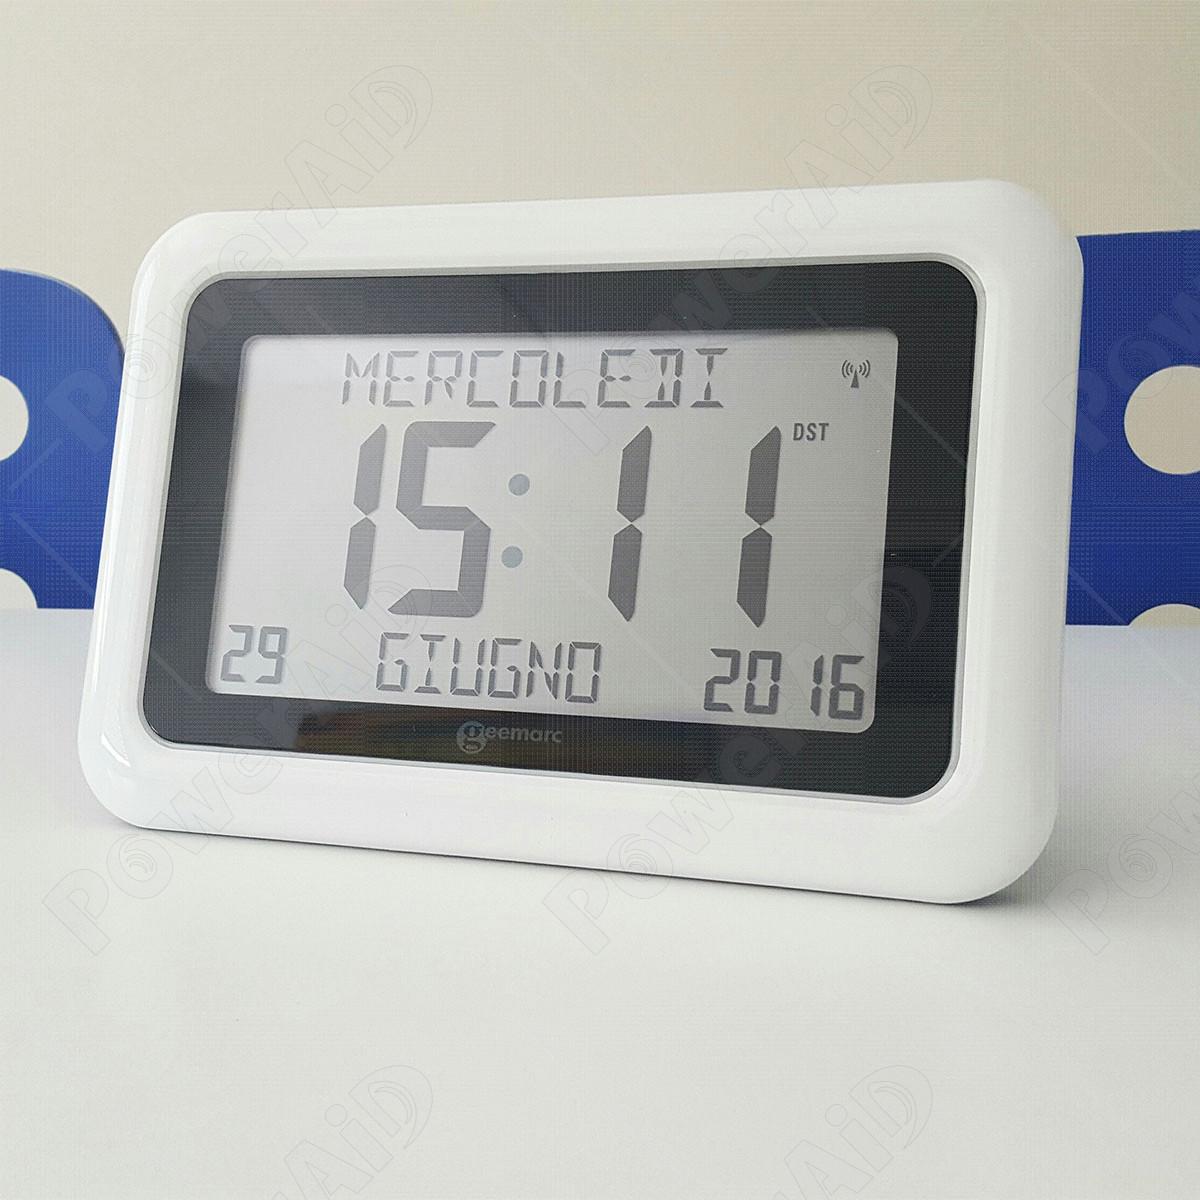 Geemarc - VISO10 orologio per demenza - Bianco